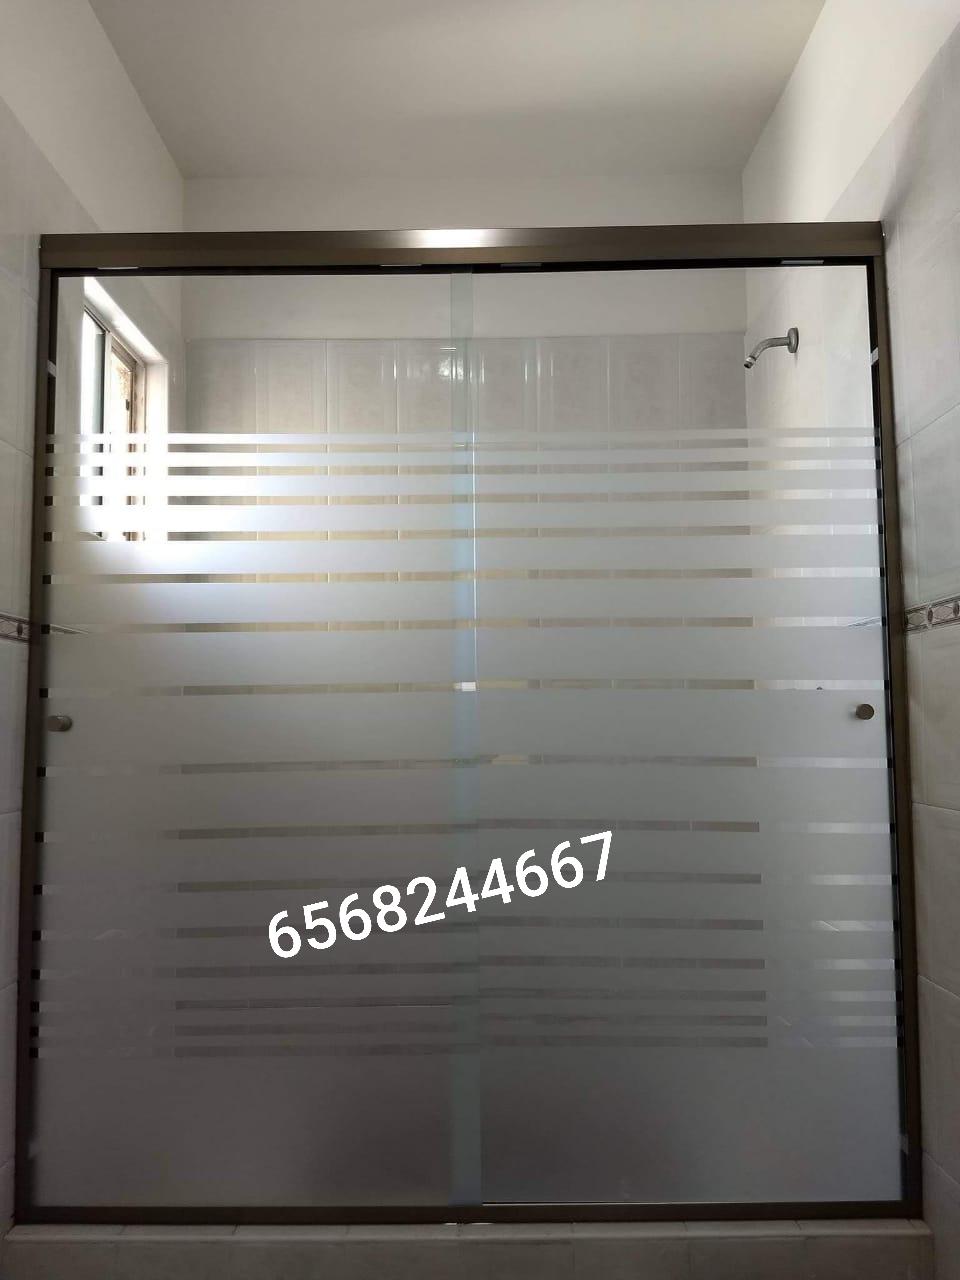 20200421_145946